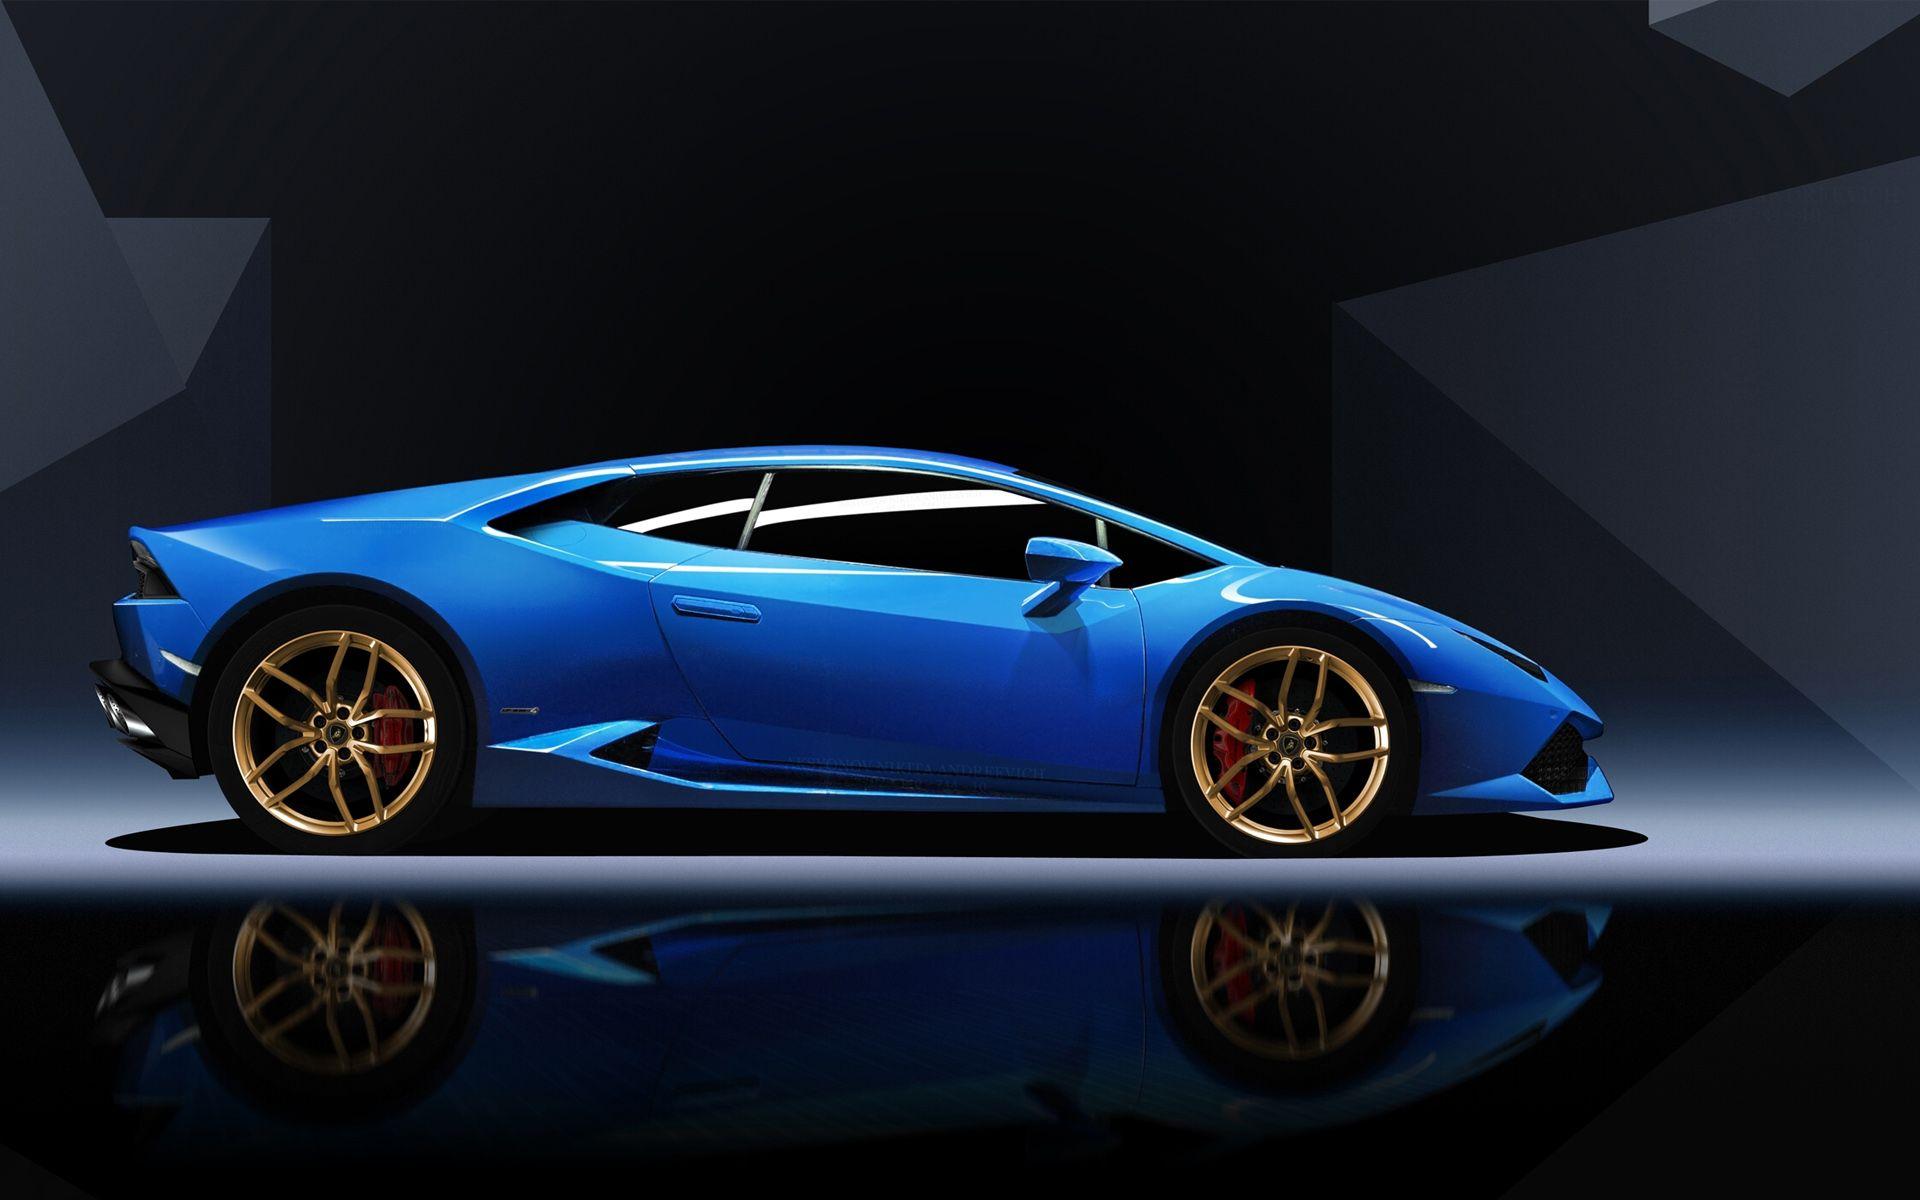 Blue Lamborghini Wallpapers Desktop Background Blue Lamborghini Lamborghini Car